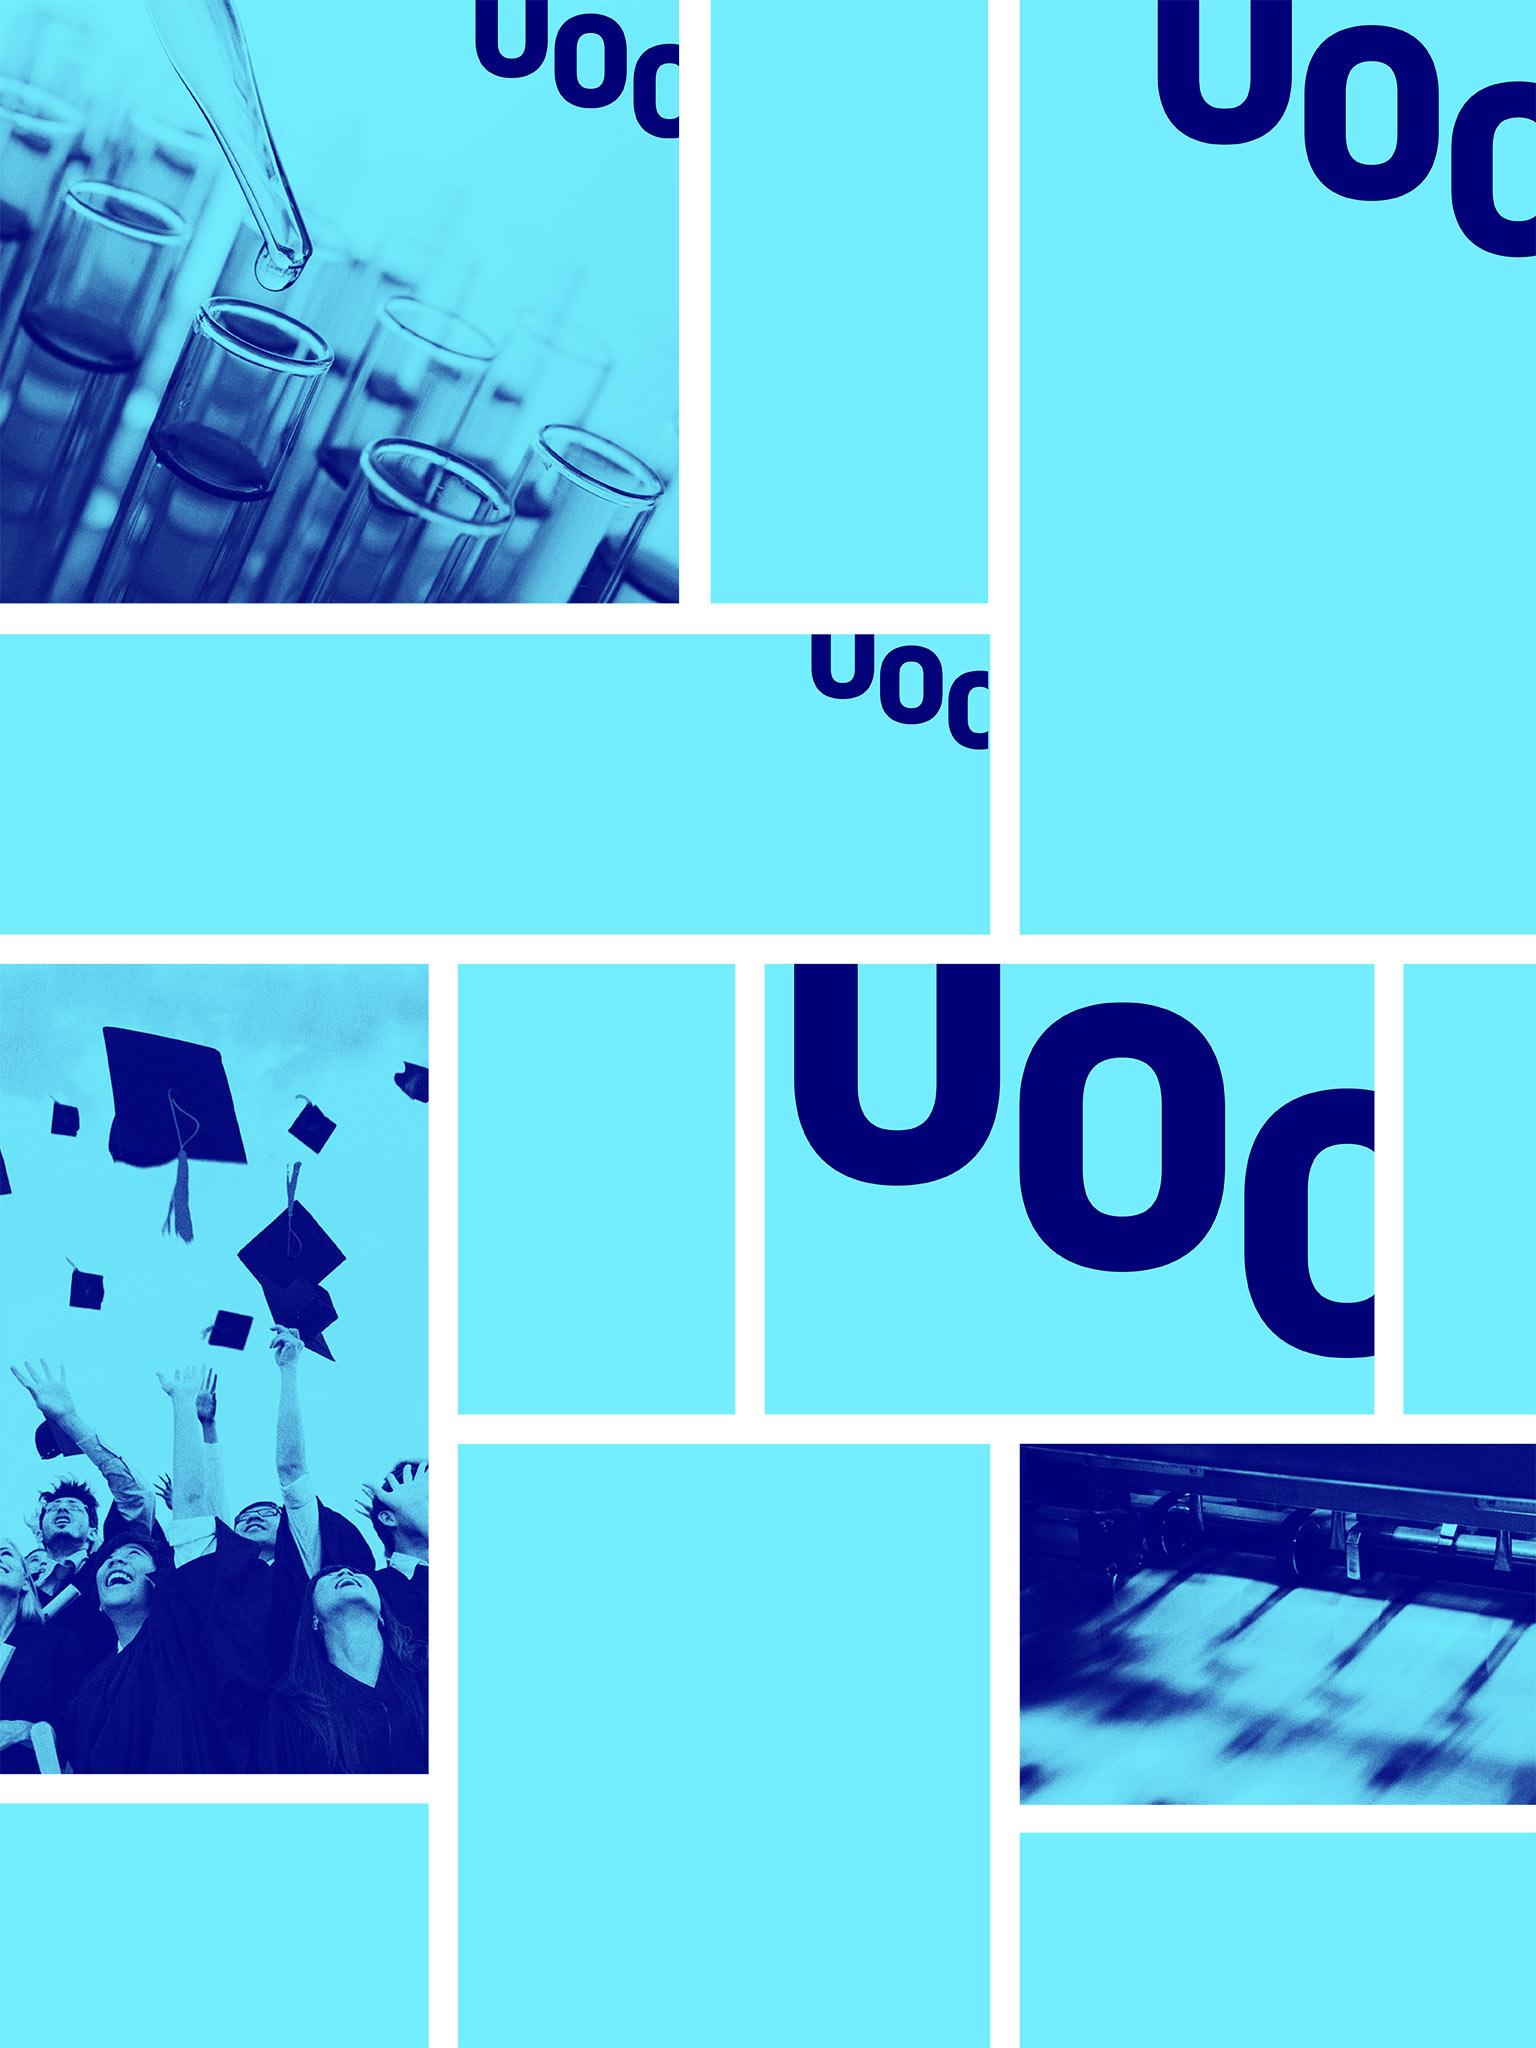 UOC Brand — Flexibilitat